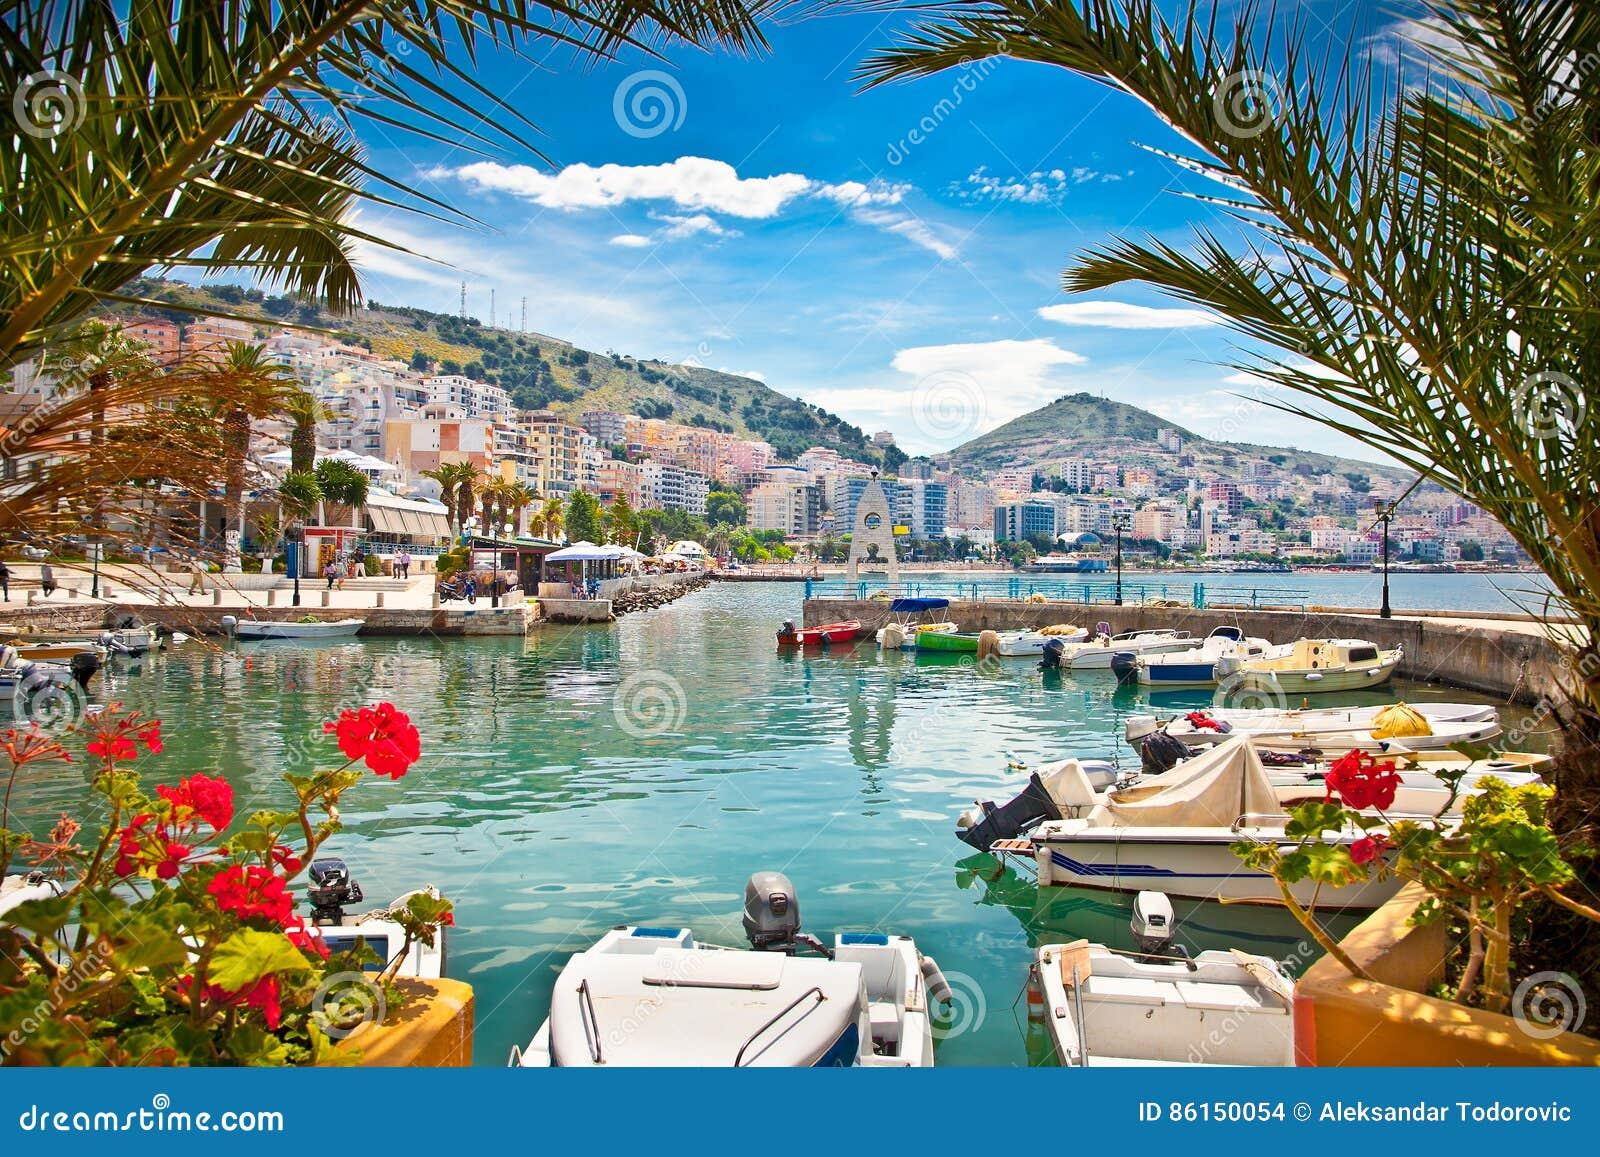 Saranda`s port at ionian sea. Albania.